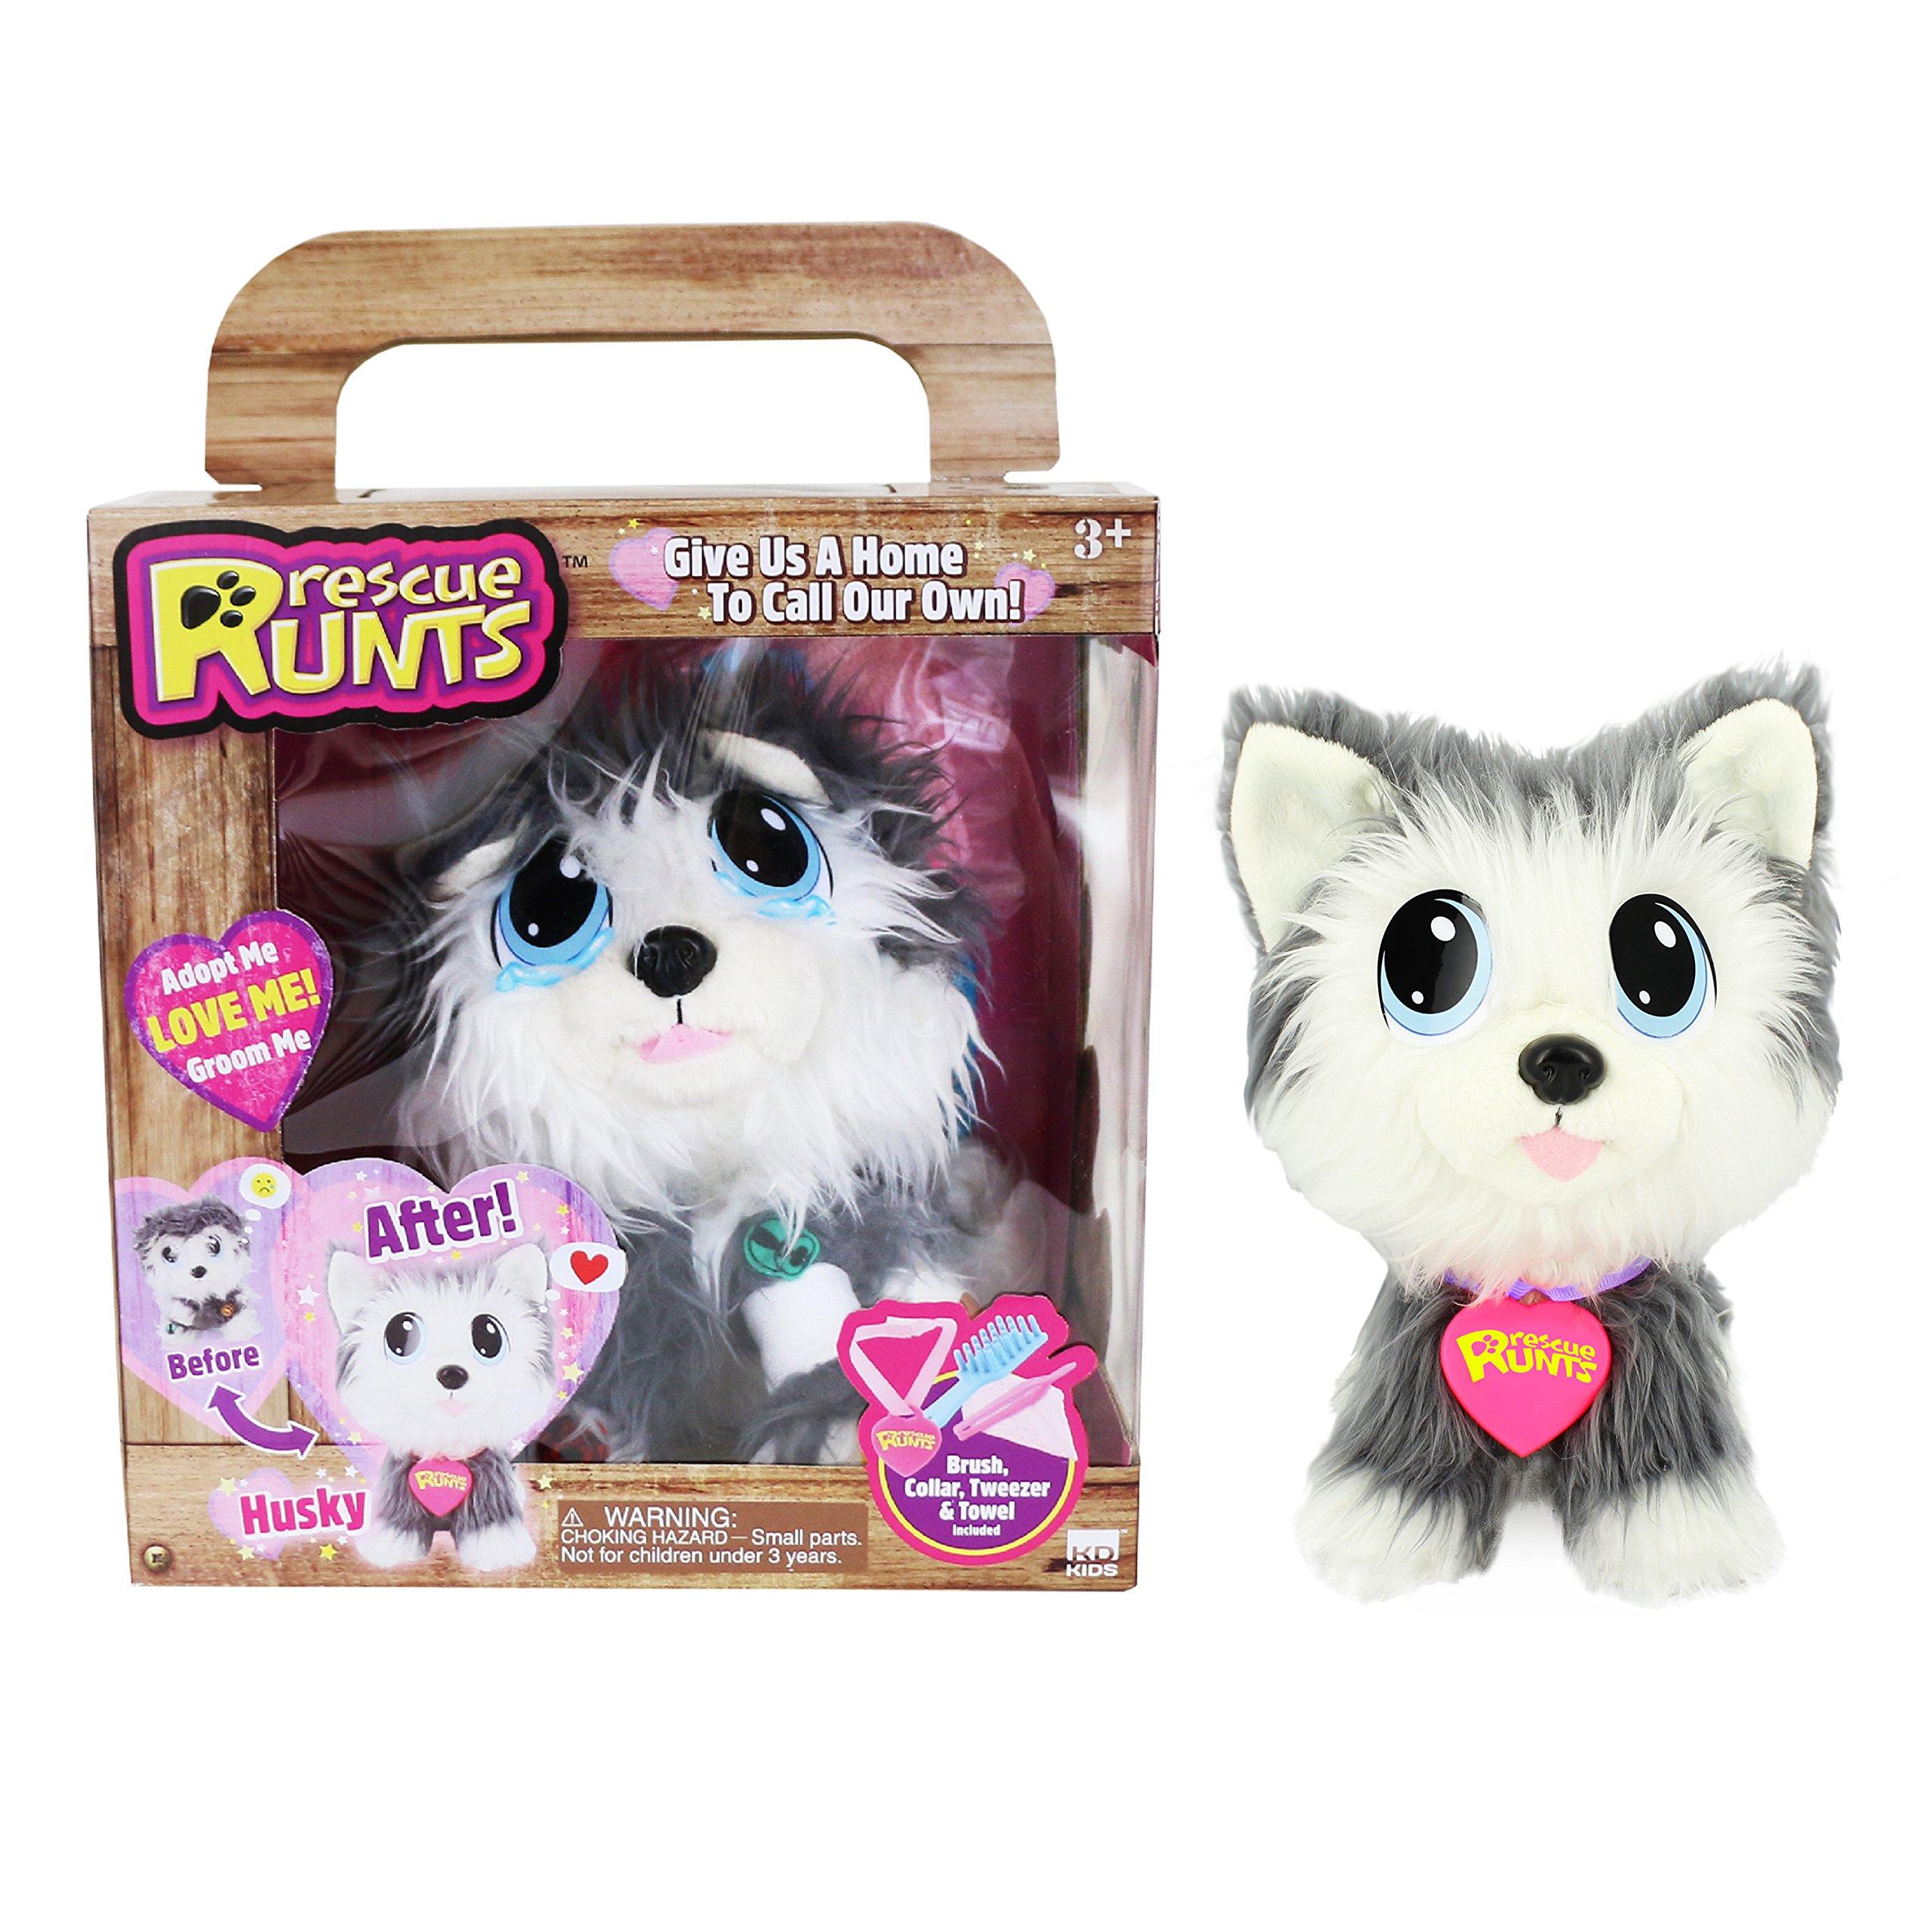 KD Kids Husky Plush Dog, White/Gray